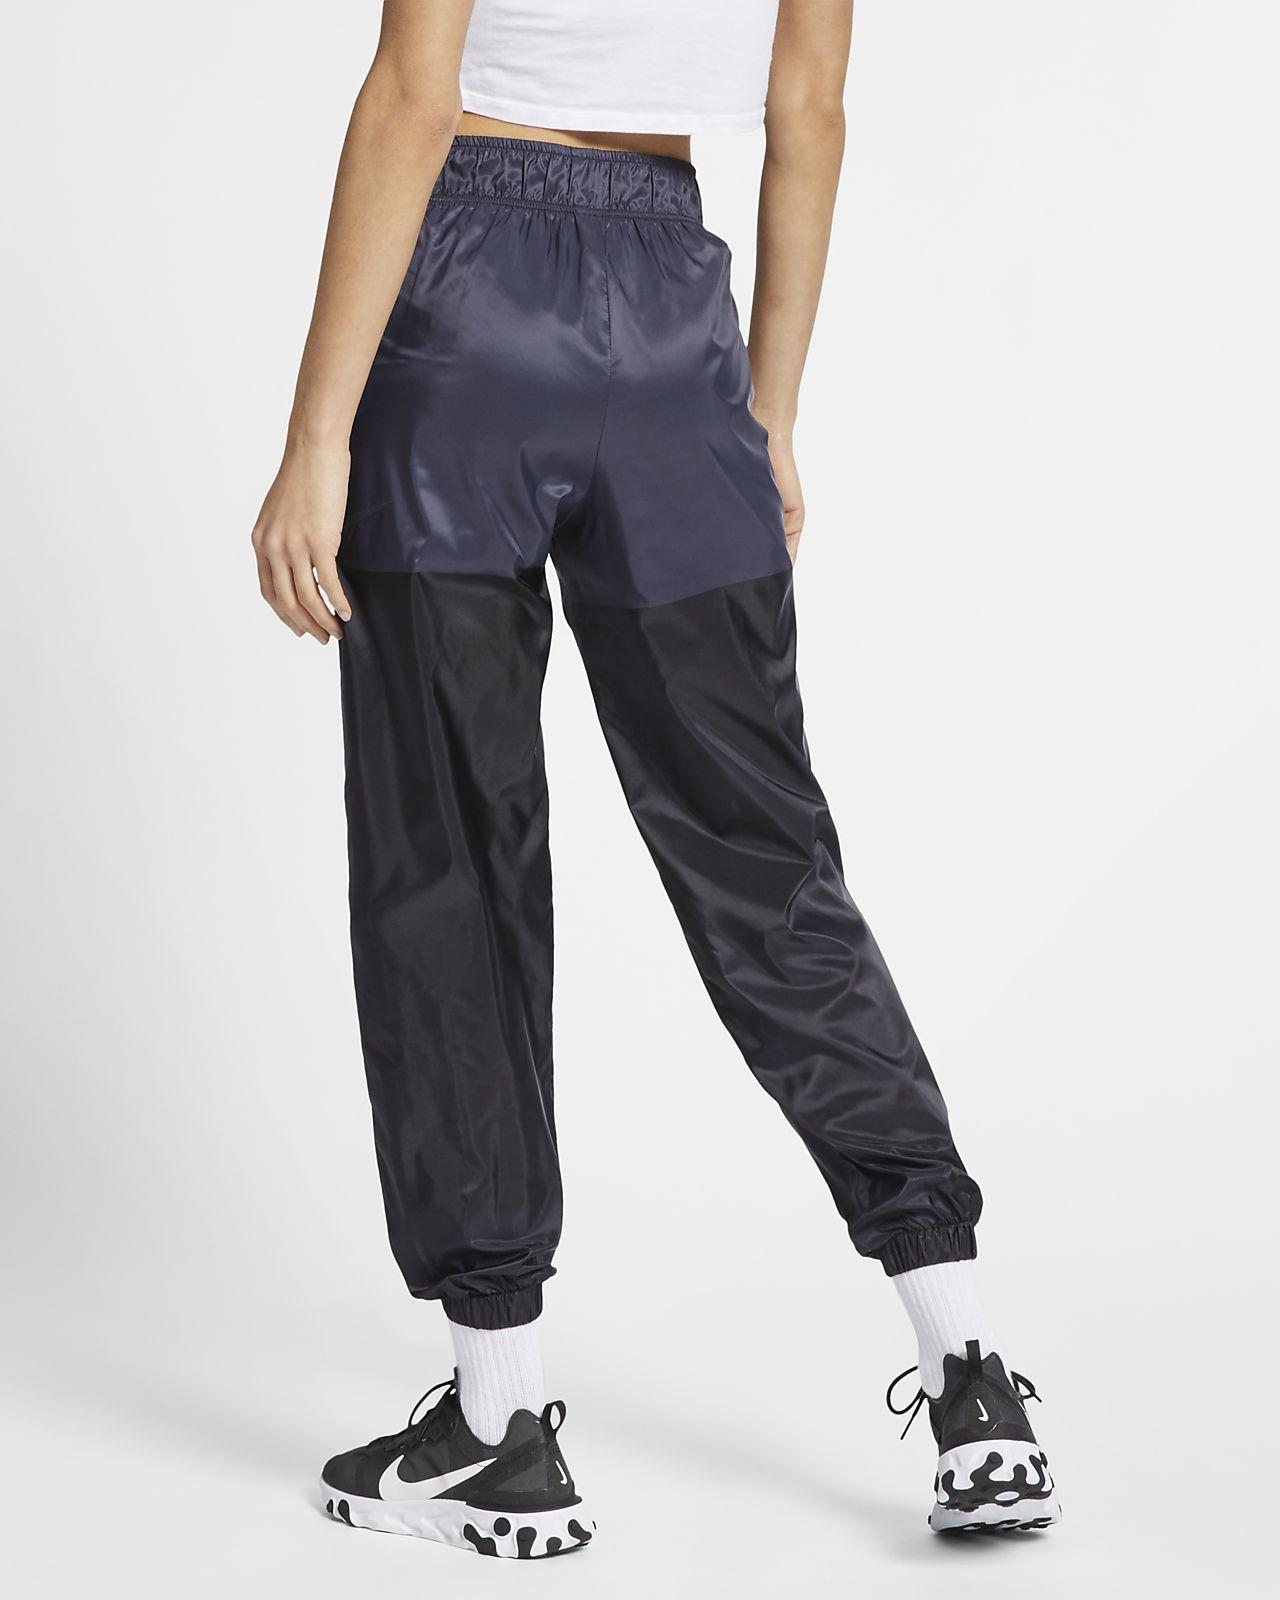 c2673432f72a6 Nike Sportswear Tech Pack Women's Woven Pants. Nike.com